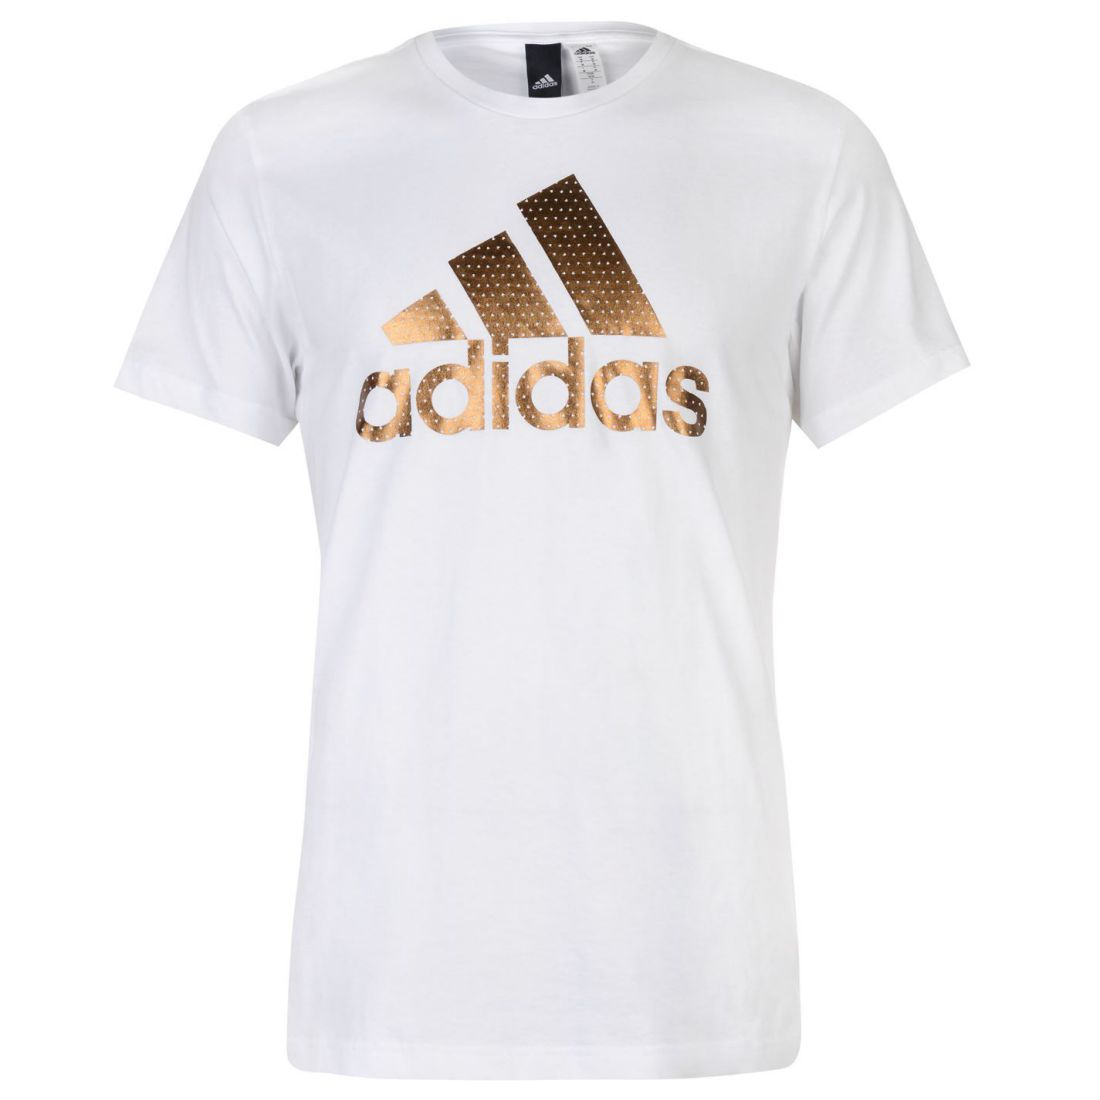 5c112a3dcf3 adidas Foil Logo T Shirt Mens Gents Crew Neck Tee Top Short Sleeve ...